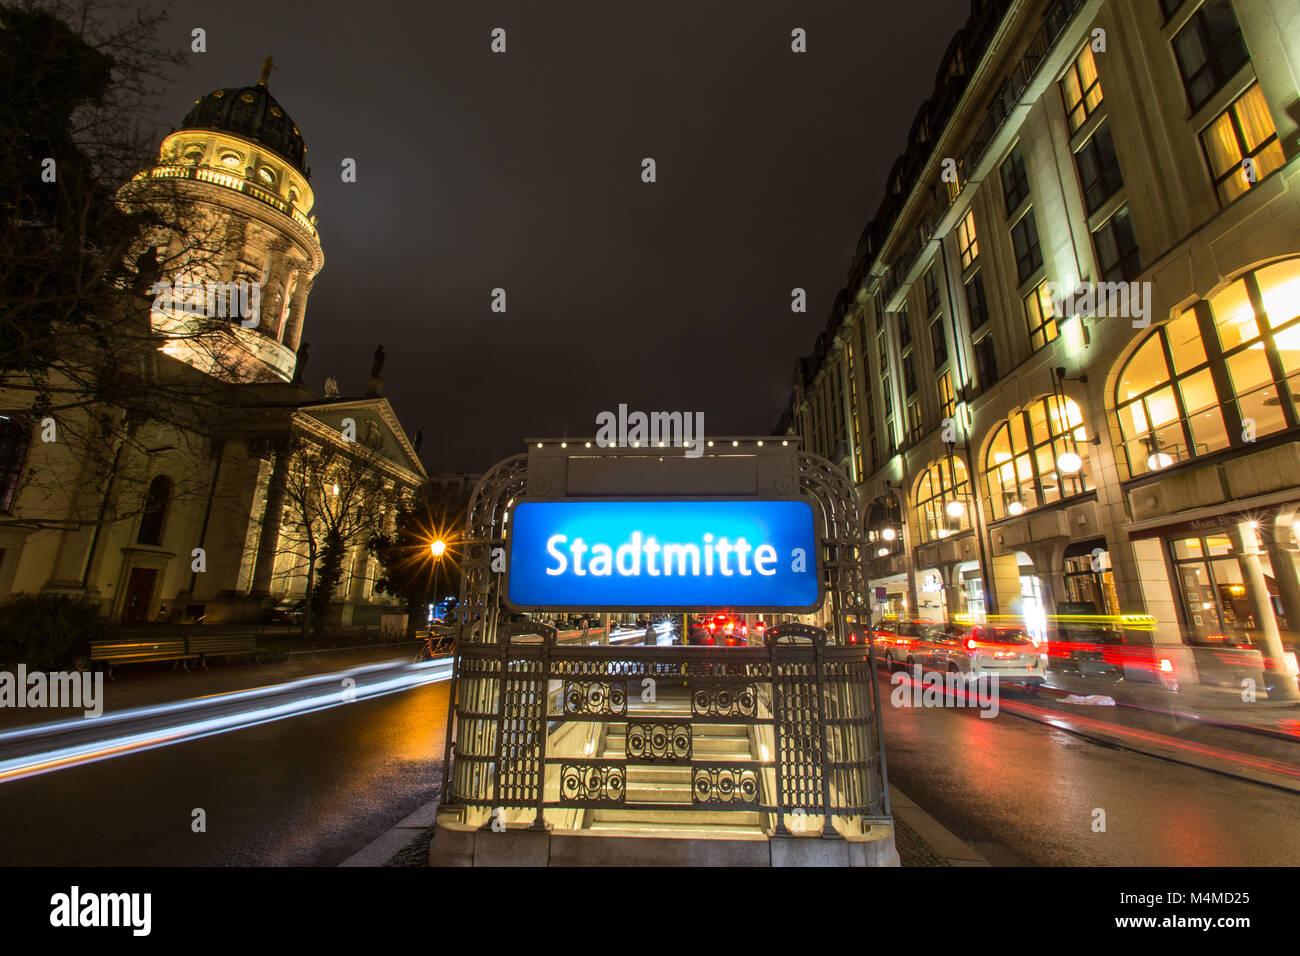 gendarmenmarkt and stadtmitte subway sign berlin germany at night - Stock Image